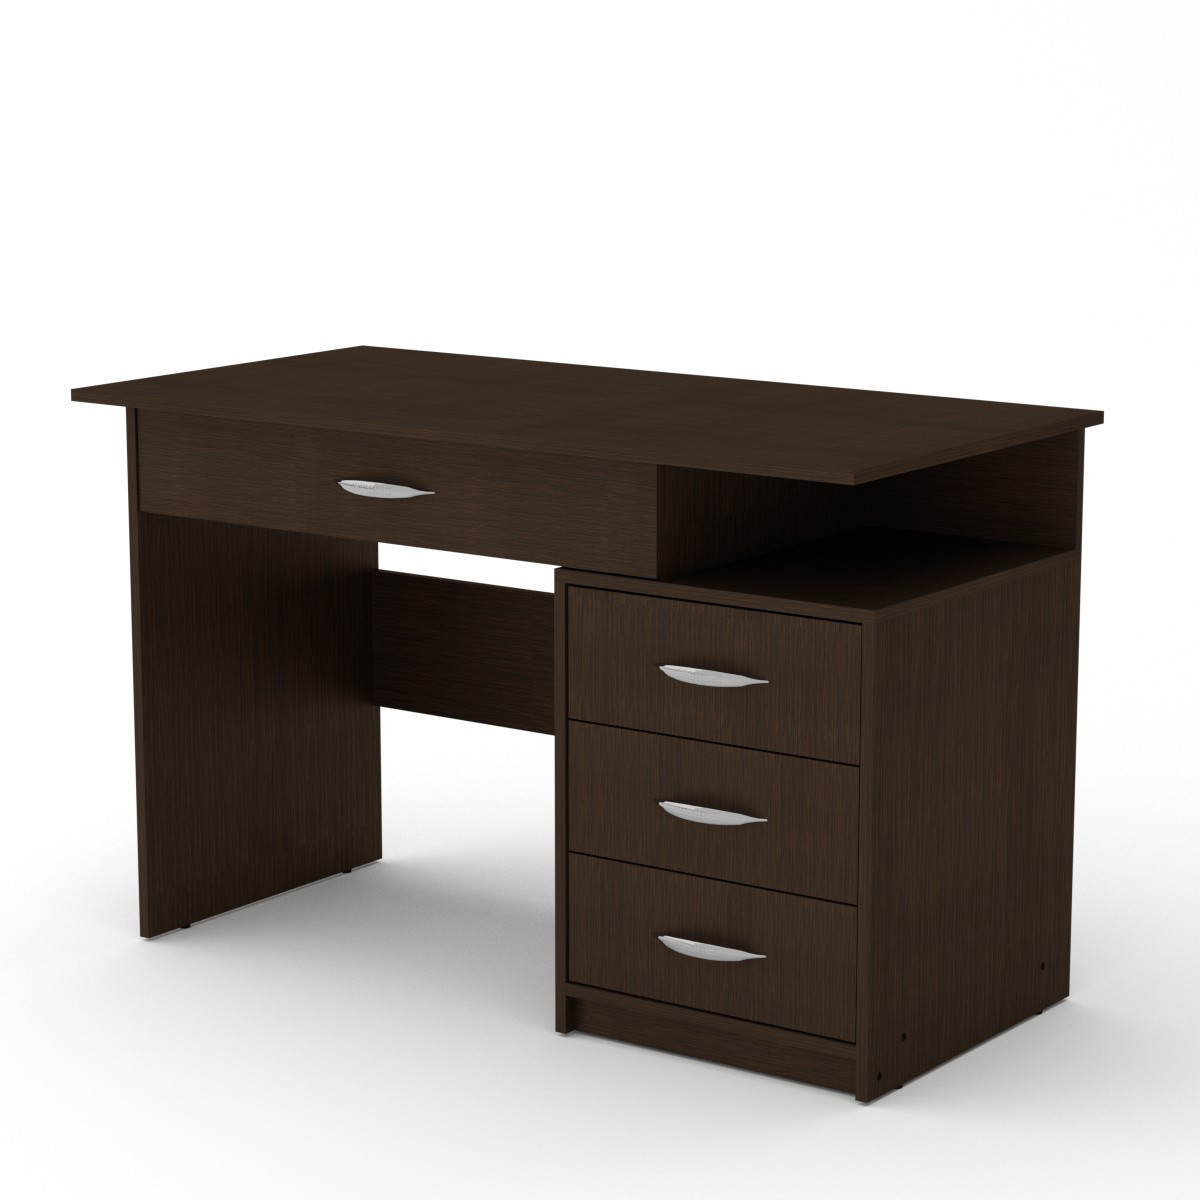 Компьютерный стол Студент-2 (1200х600х750)